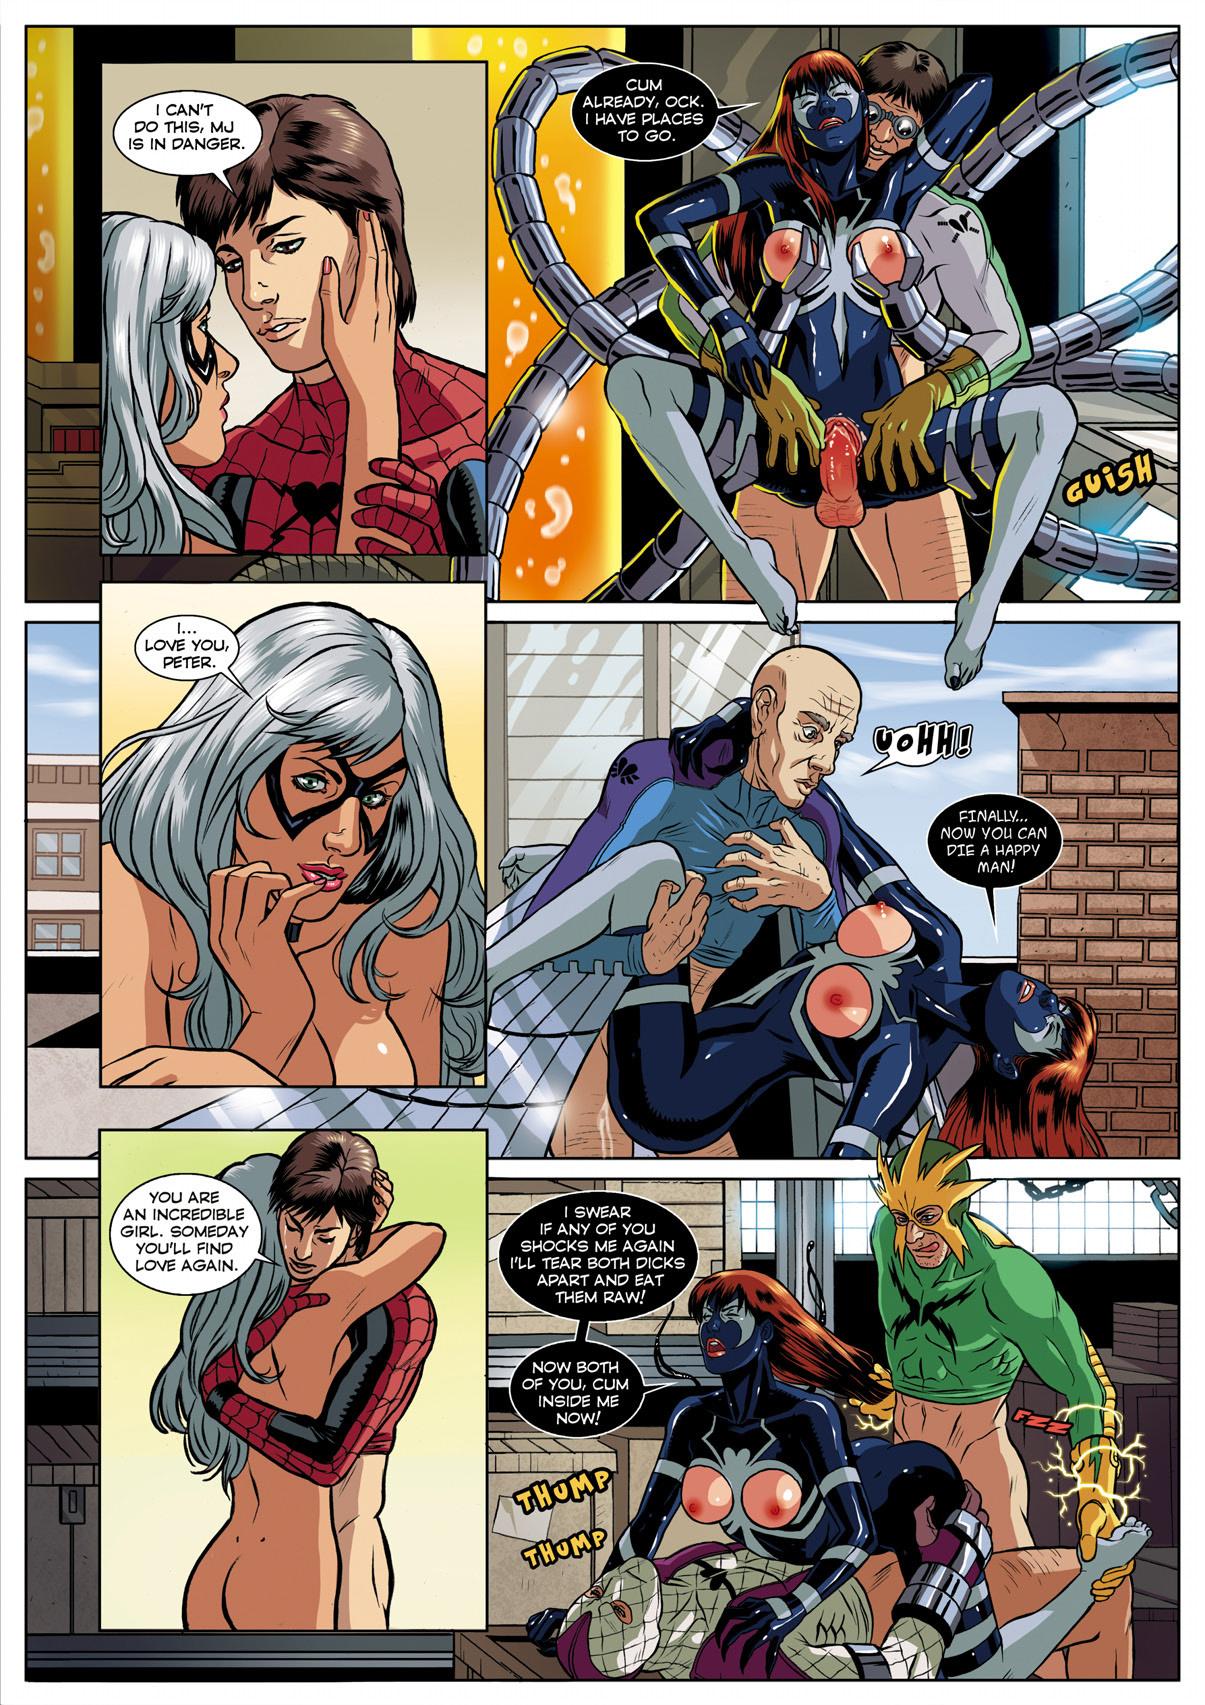 Sexual Symbiosis 1 cartoon porn Oral sex, Anal Sex, Double Penetration, Group Sex, Masturbation, Monster Girls, Rape